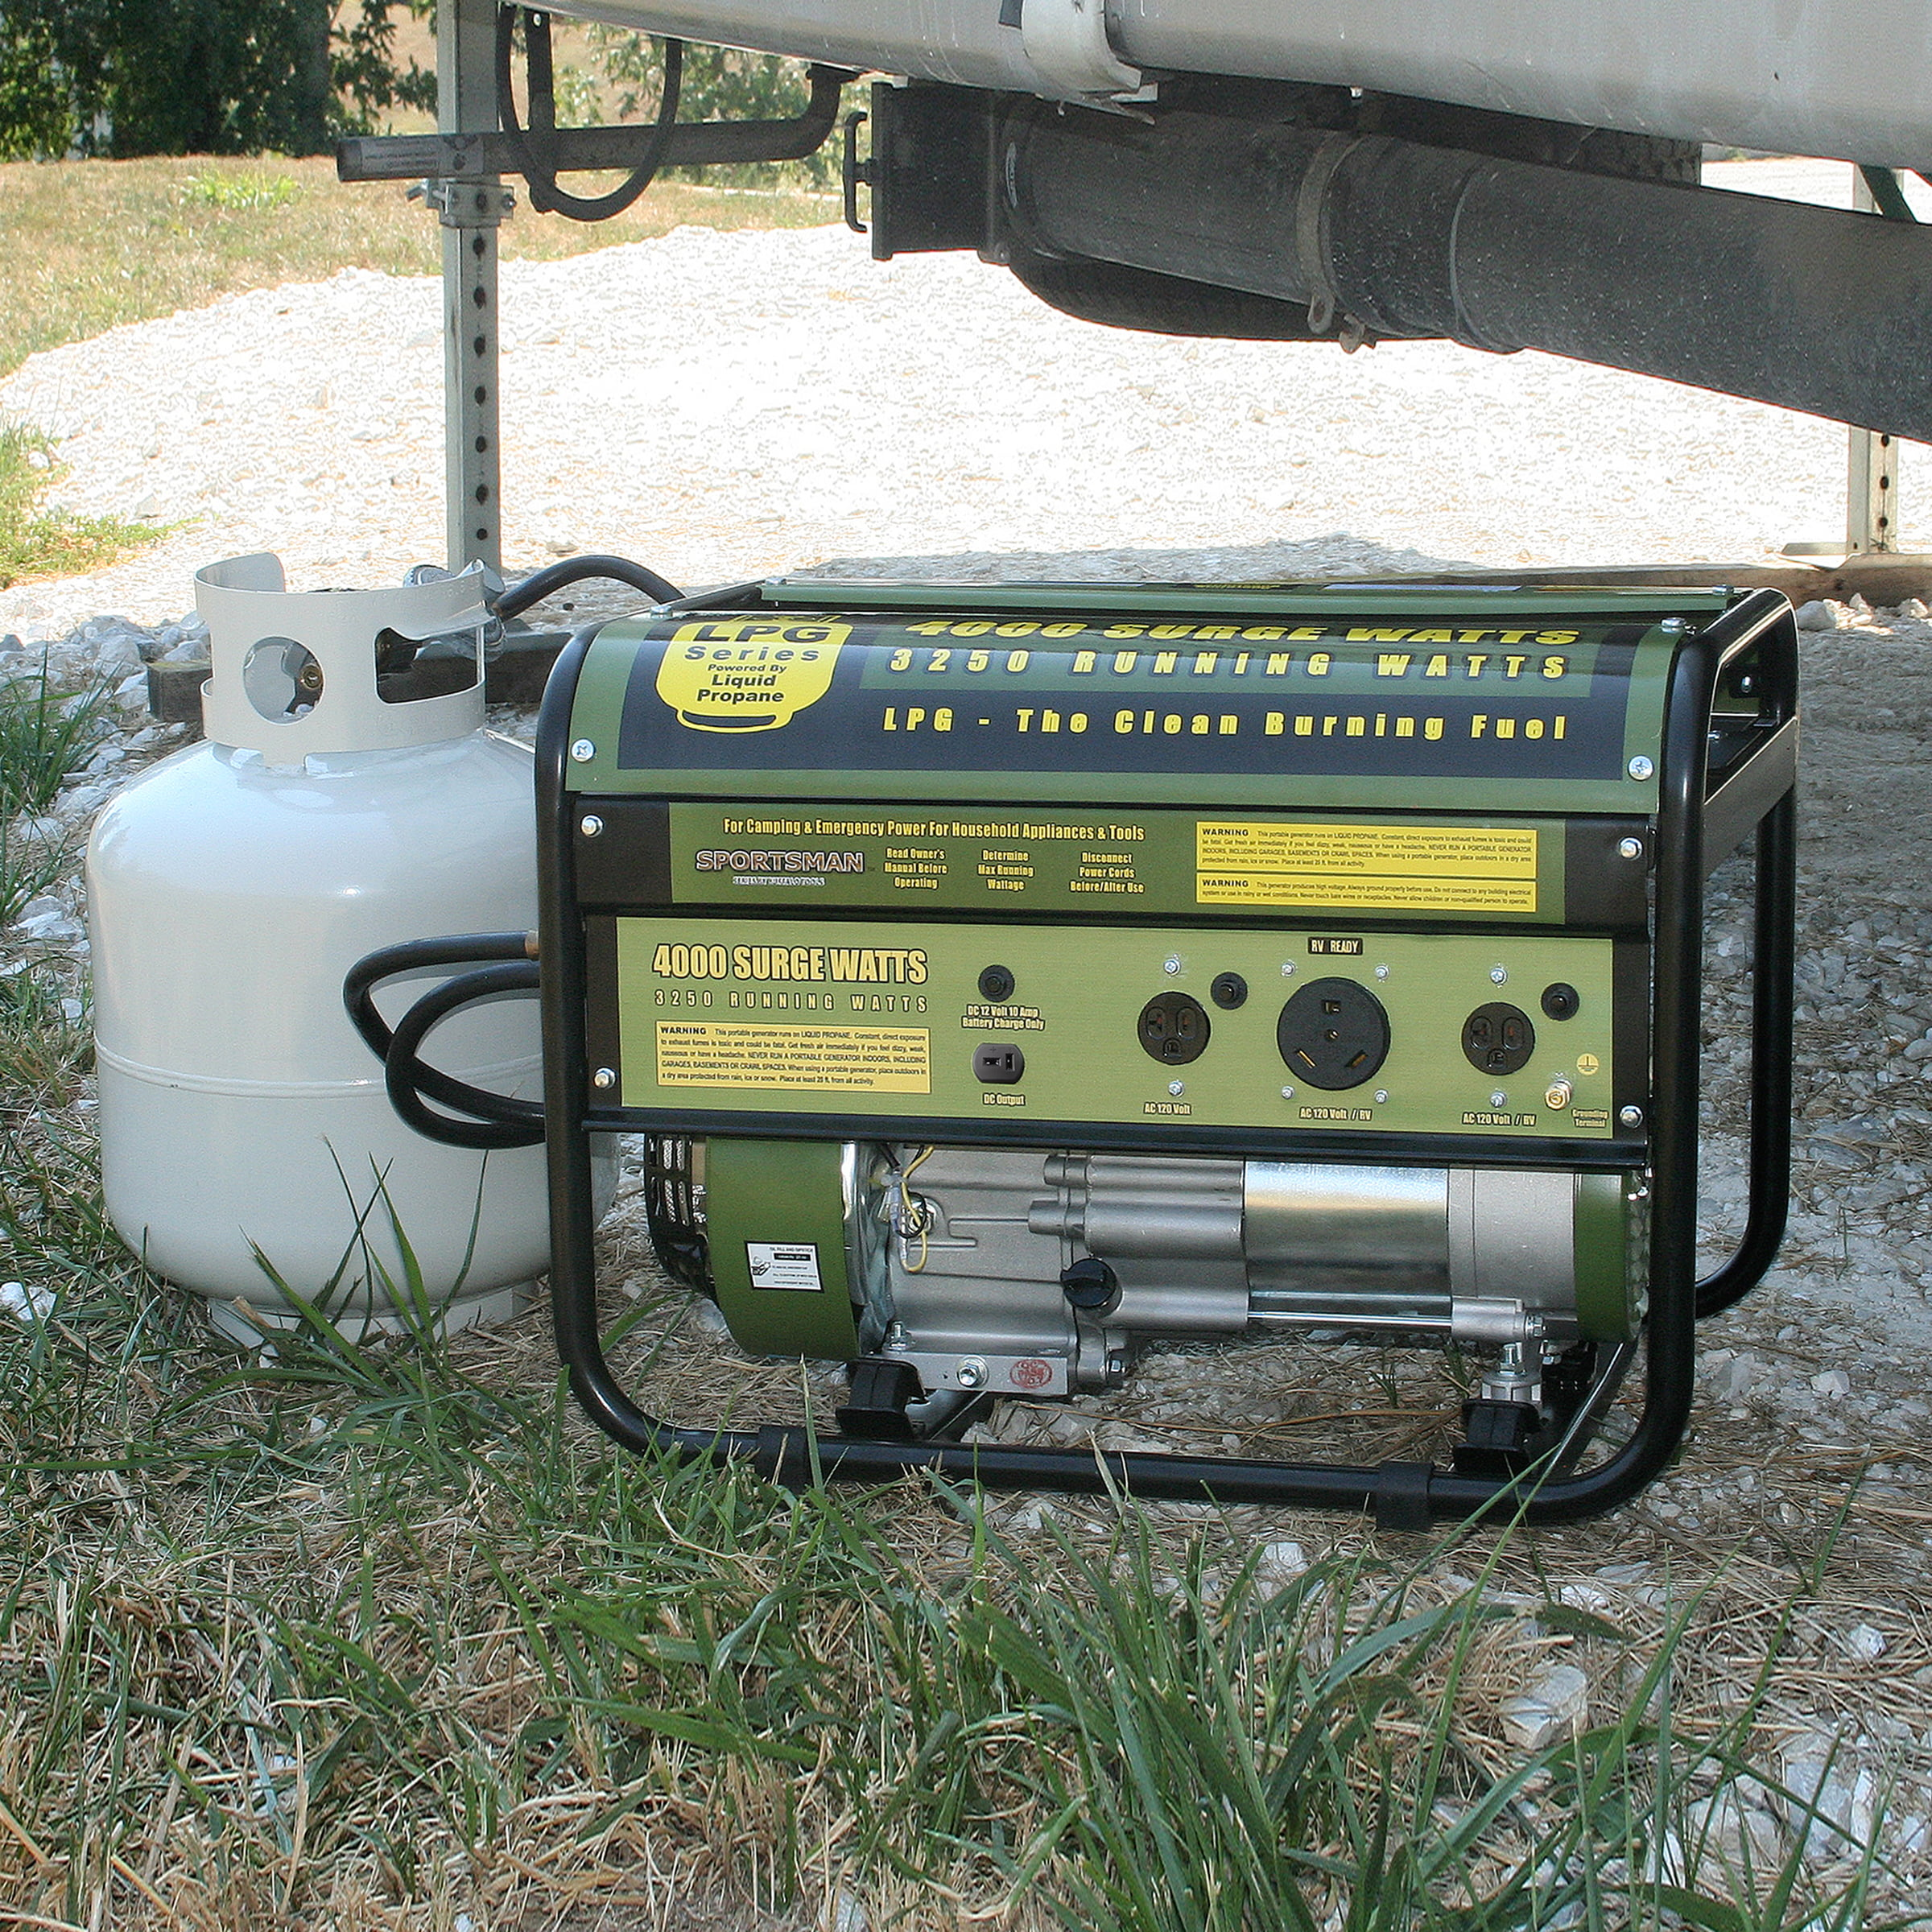 4000 Watt Lp Generator Sportsmans Series Emergency Camping Propane Ready